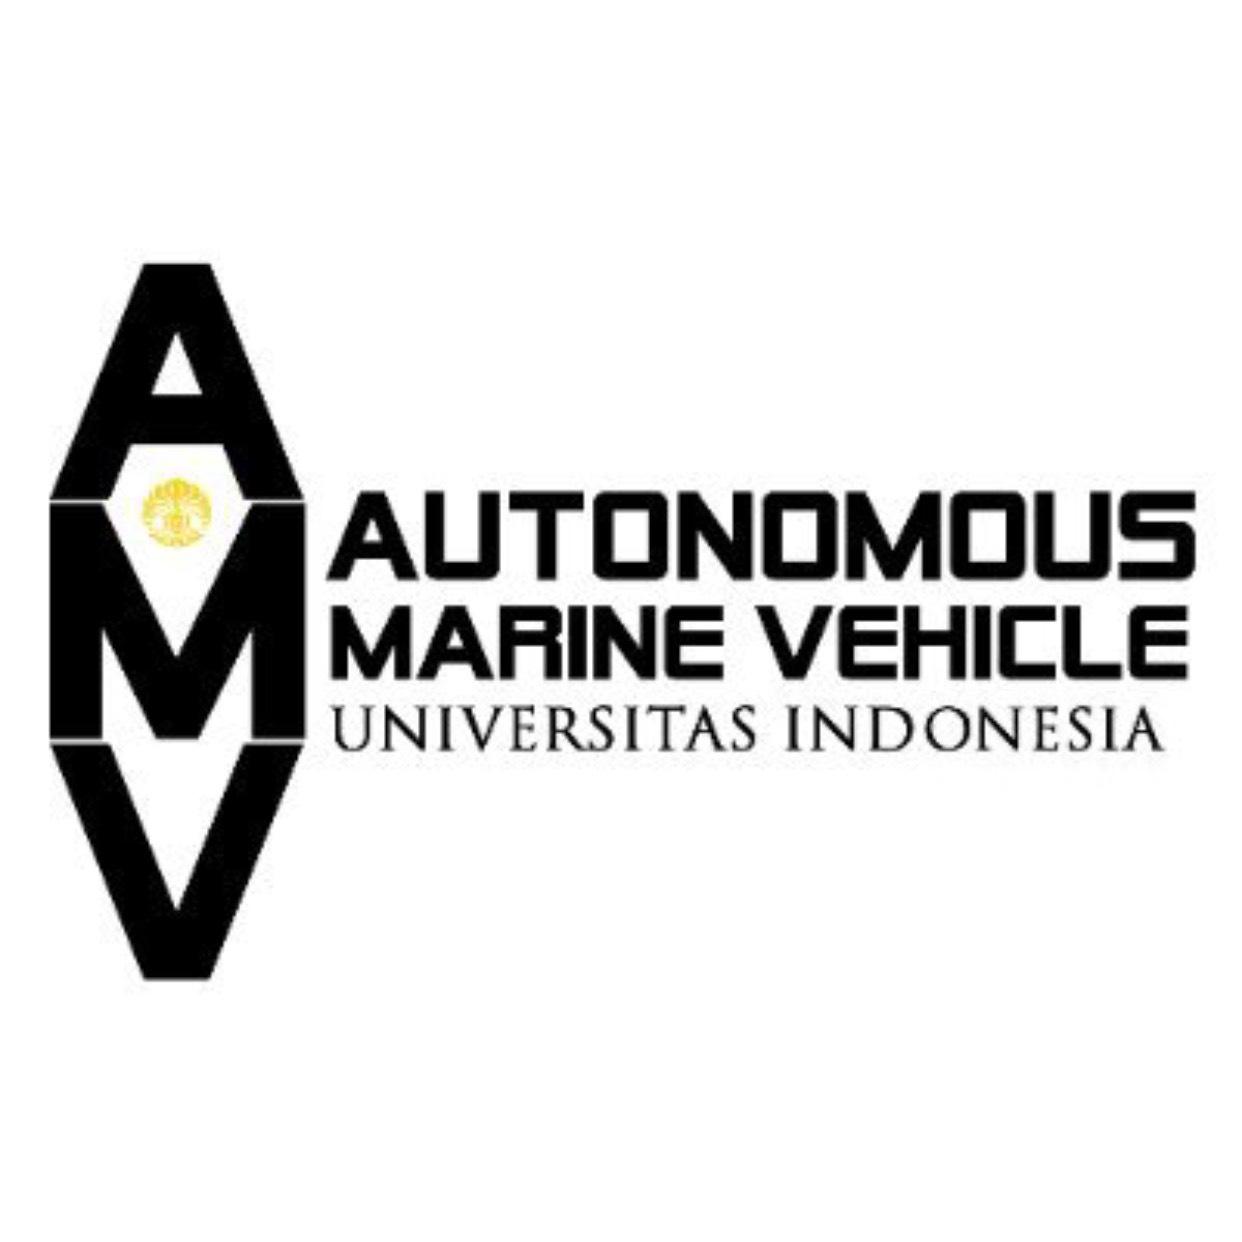 #1 Autonomous Marine Vehicle Universitas Indonesia